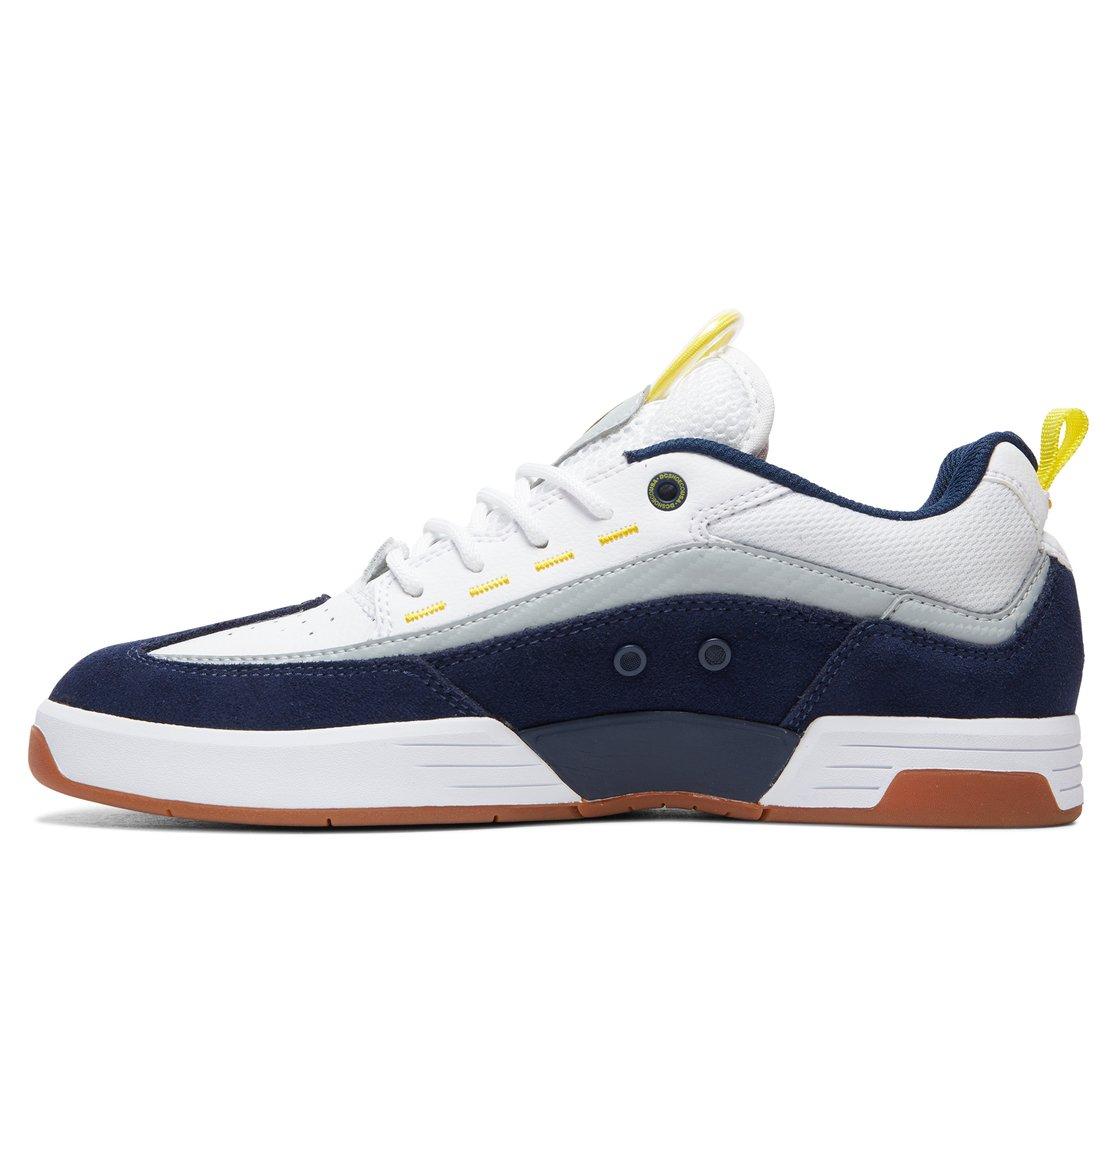 Legacy Blanc redox 7iVcOU skate S DC Chaussures Shoes 98 de Slim qq7Hwr